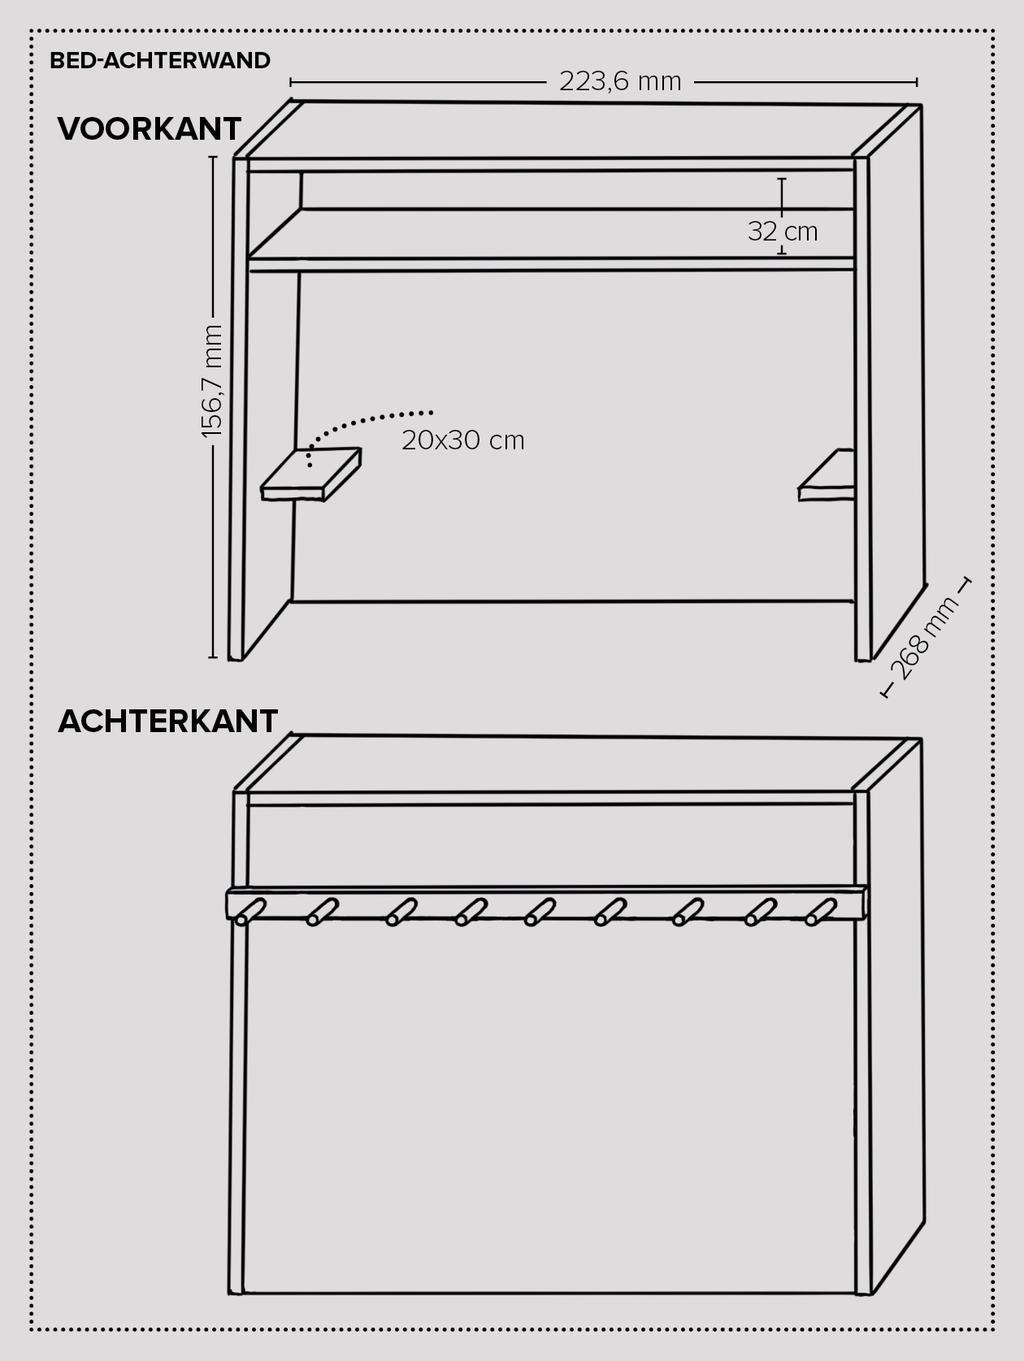 vtwonen 11-2019 | diy large werktekening bed achterwand roomdivider